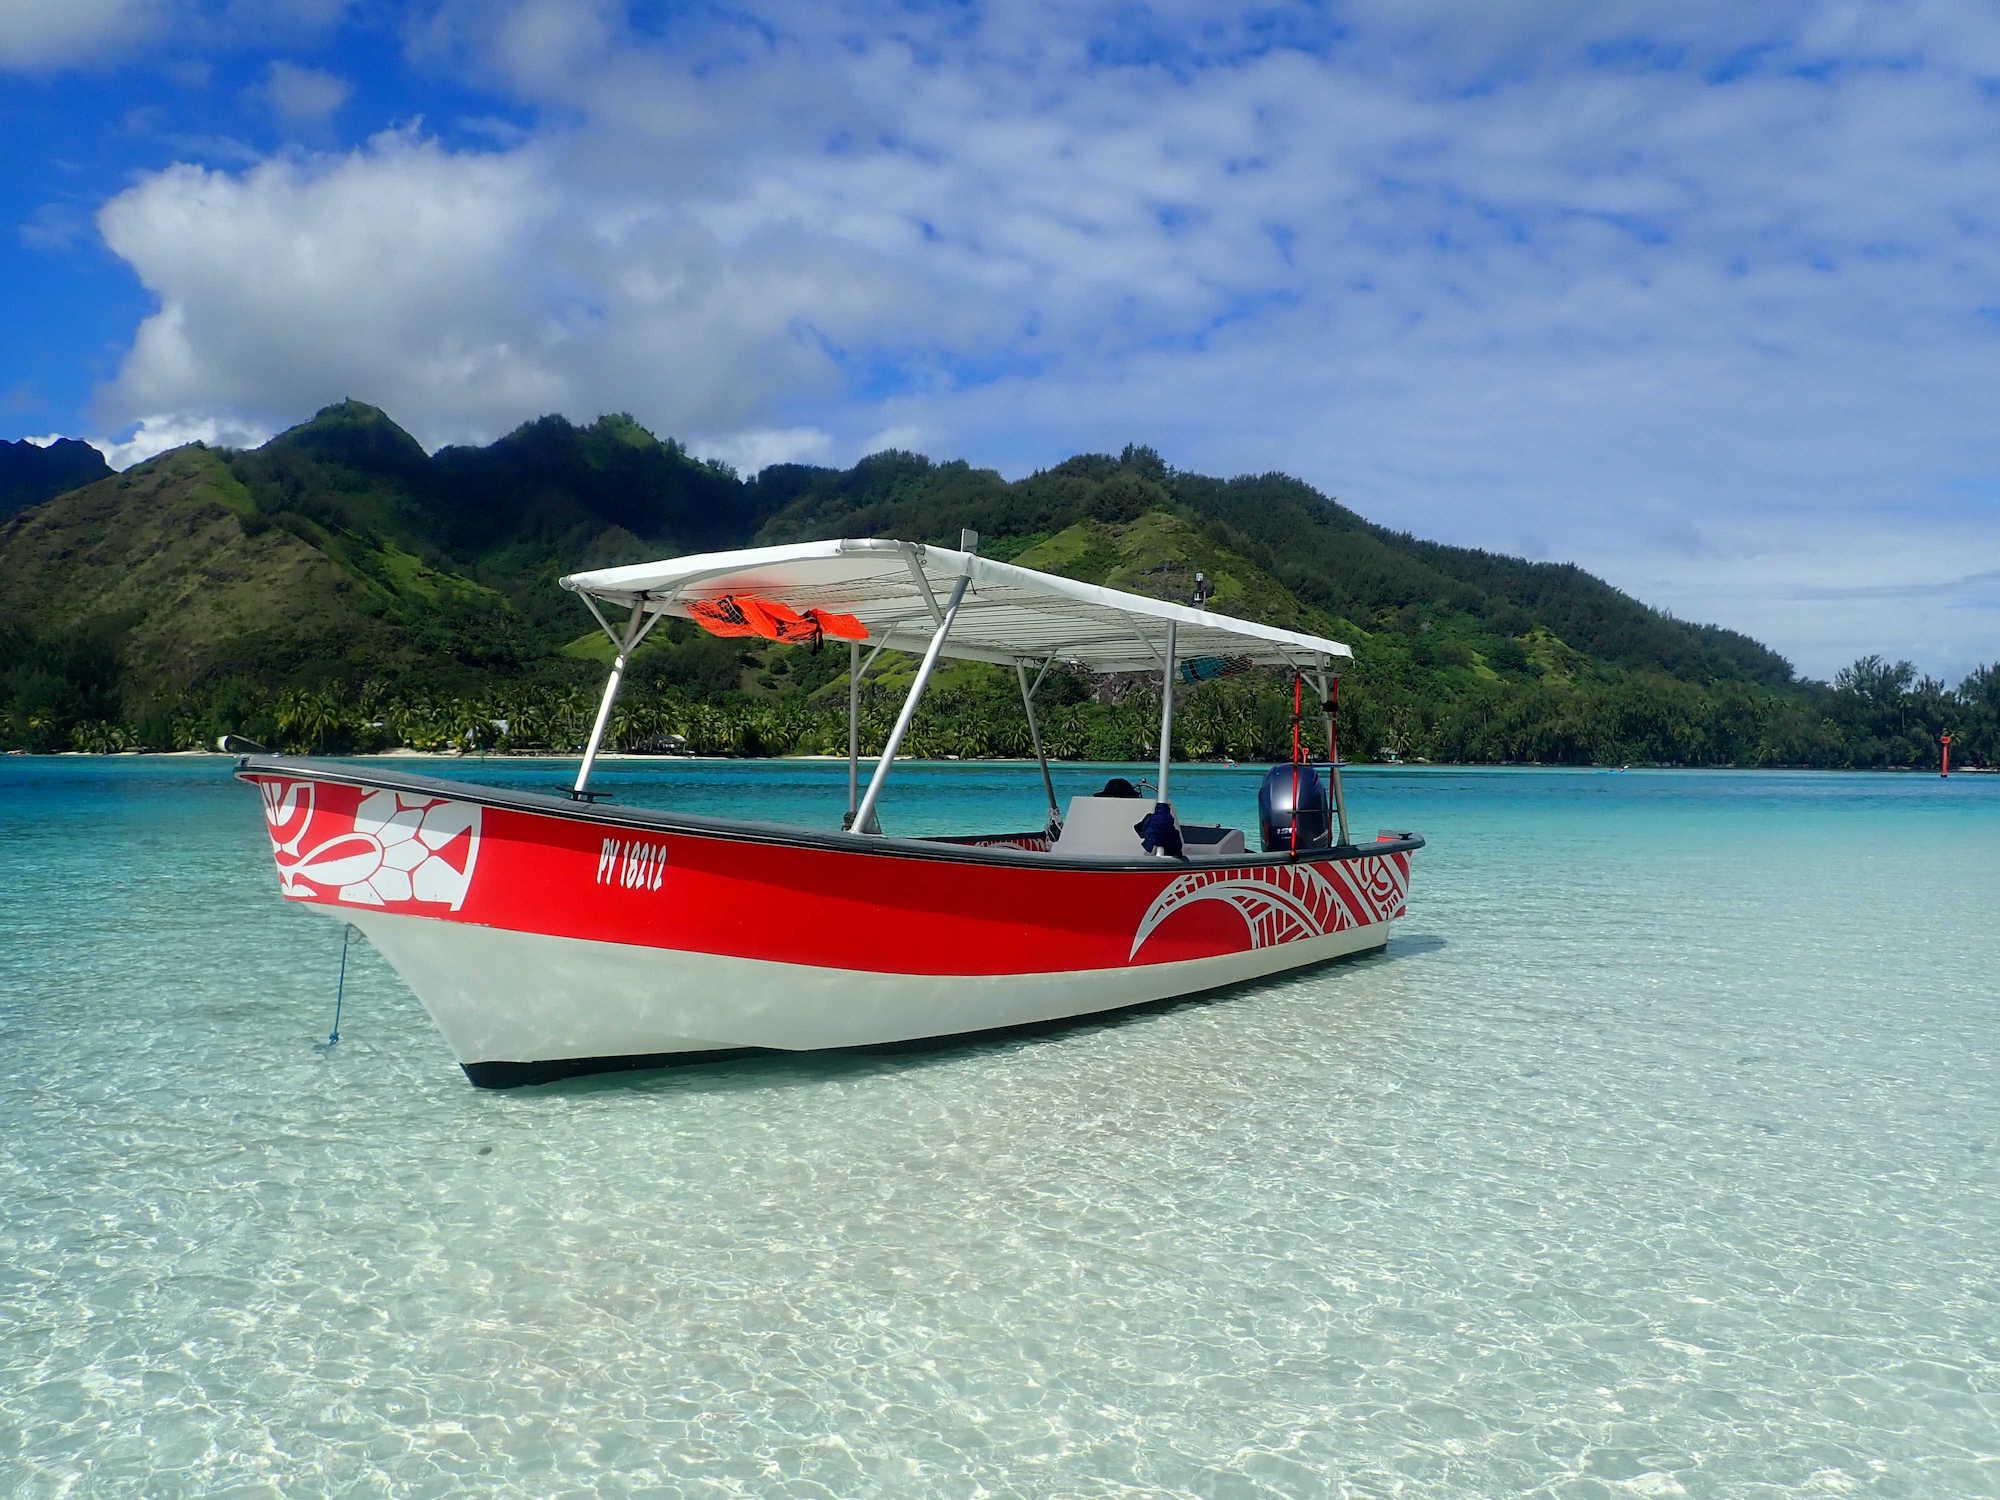 https://tahititourisme.jp/wp-content/uploads/2020/09/Boat-Hinaloa.jpg